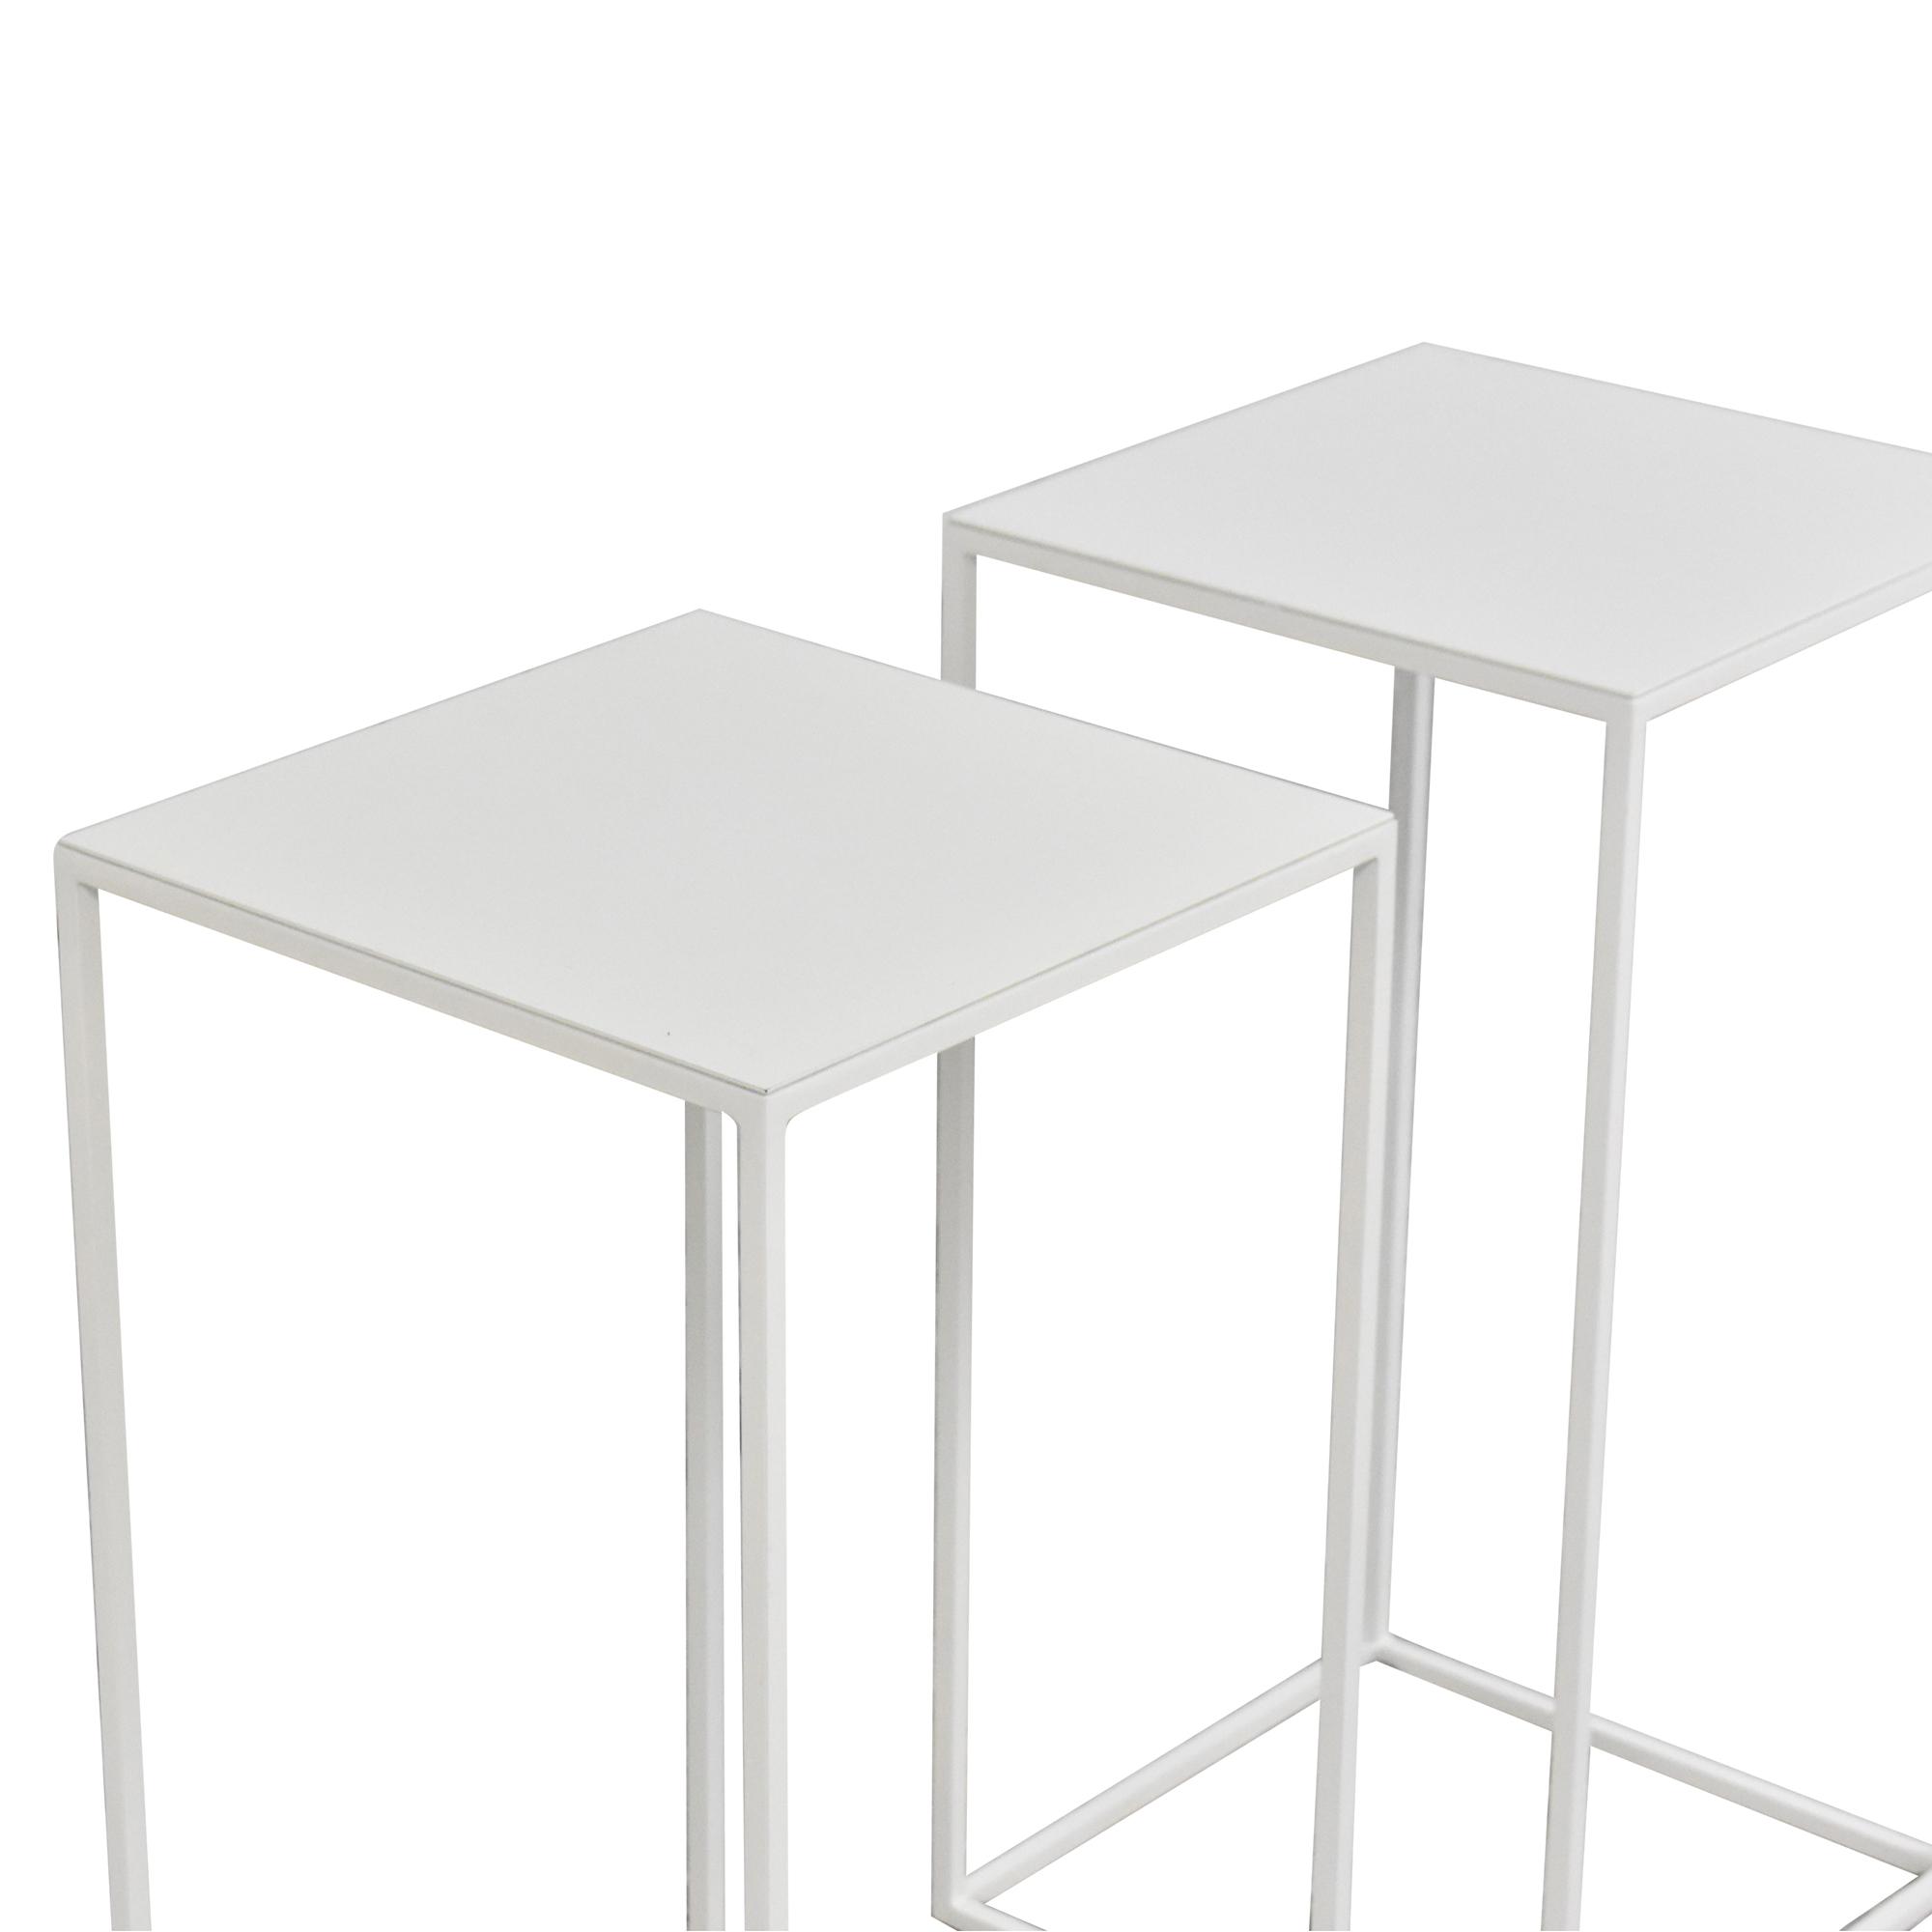 buy ABC Carpet & Home Box Frame Side Tables ABC Carpet & Home Accent Tables